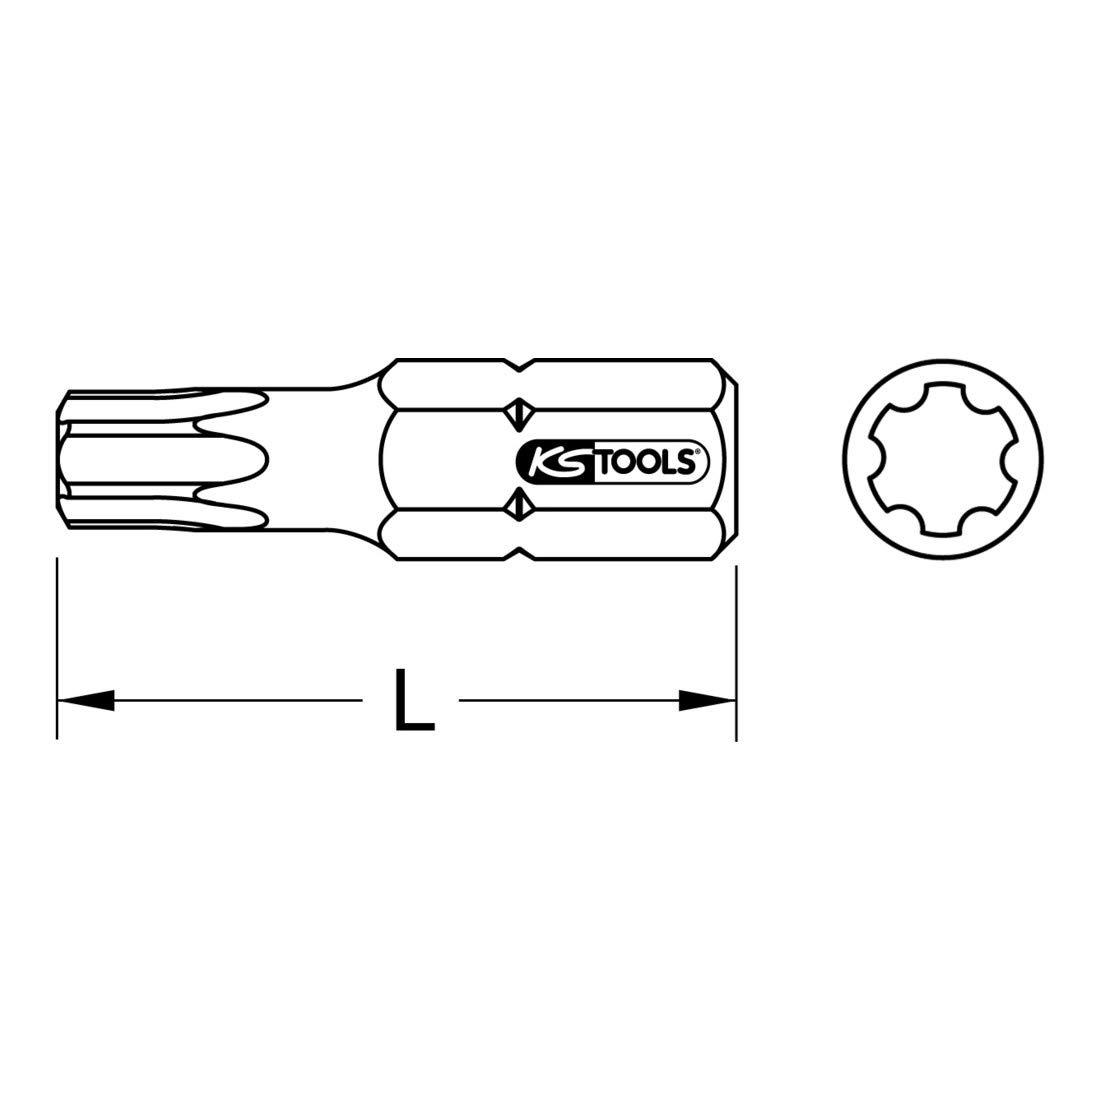 IP20 KS Tools 911.3242 1//4 CLASSIC TX PLUS Bit 30mm